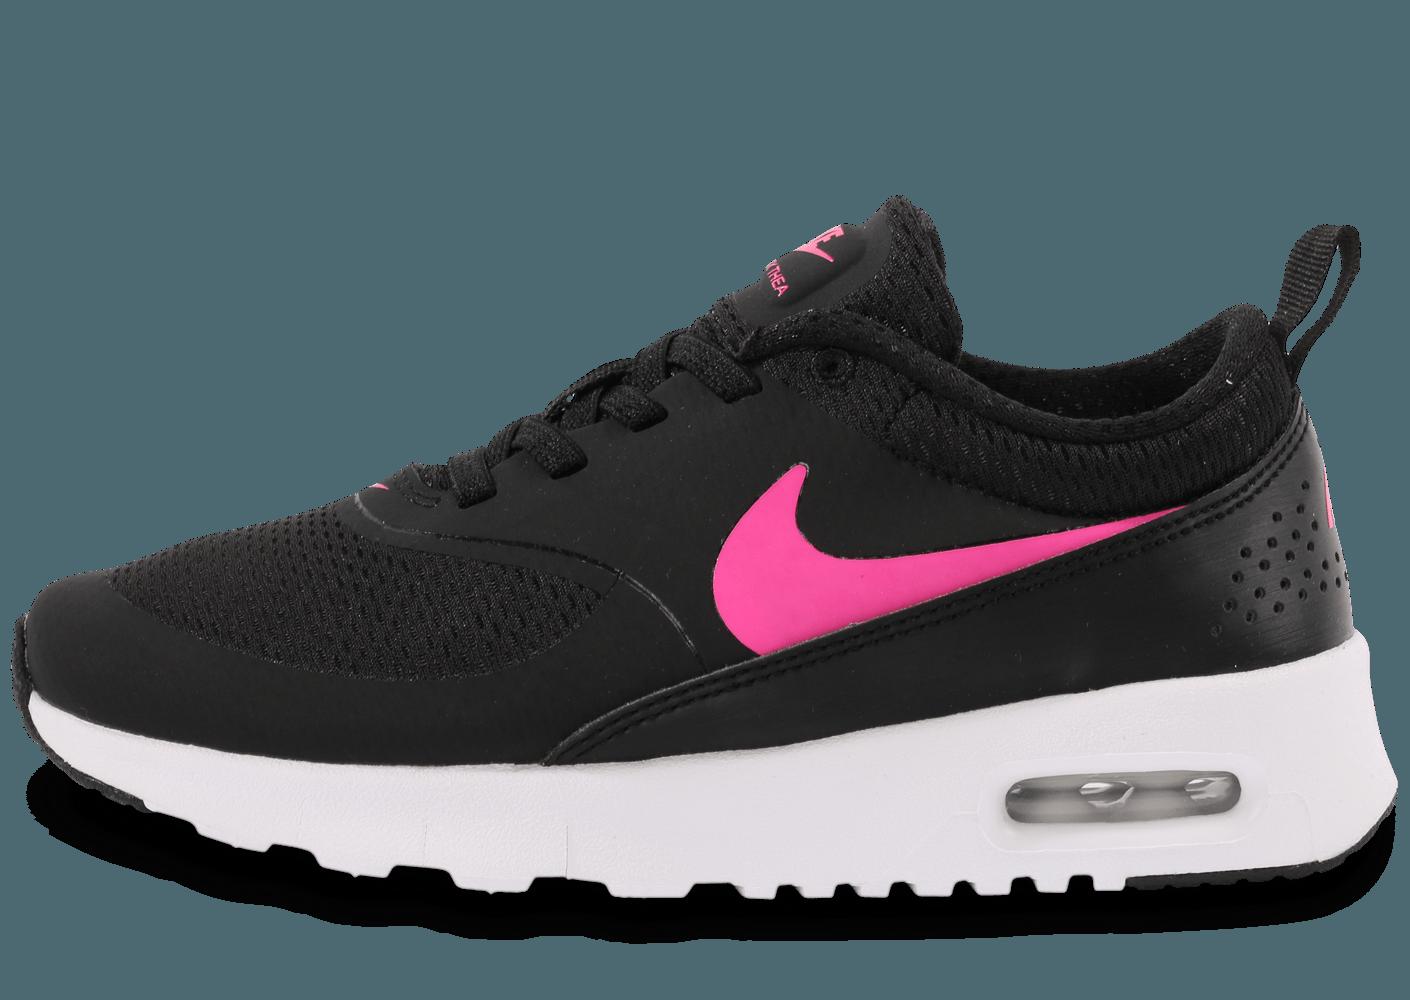 8d3ae332f690 chaussure nike noir et rose 1